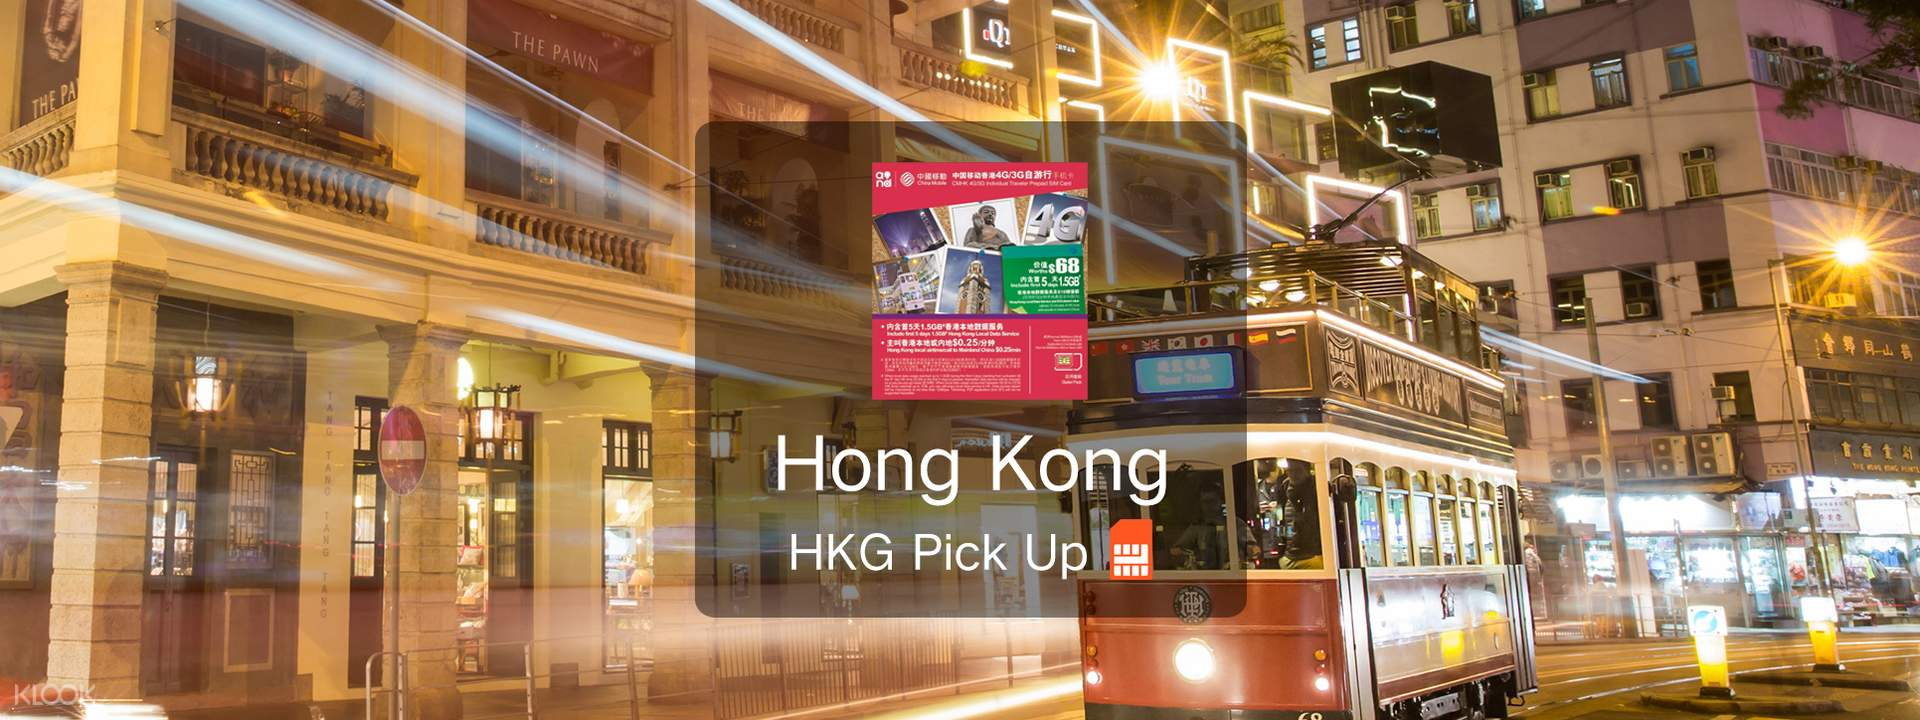 "4G or 3G SIM Card (HK Airport Pick Up) for Hong Kong"""